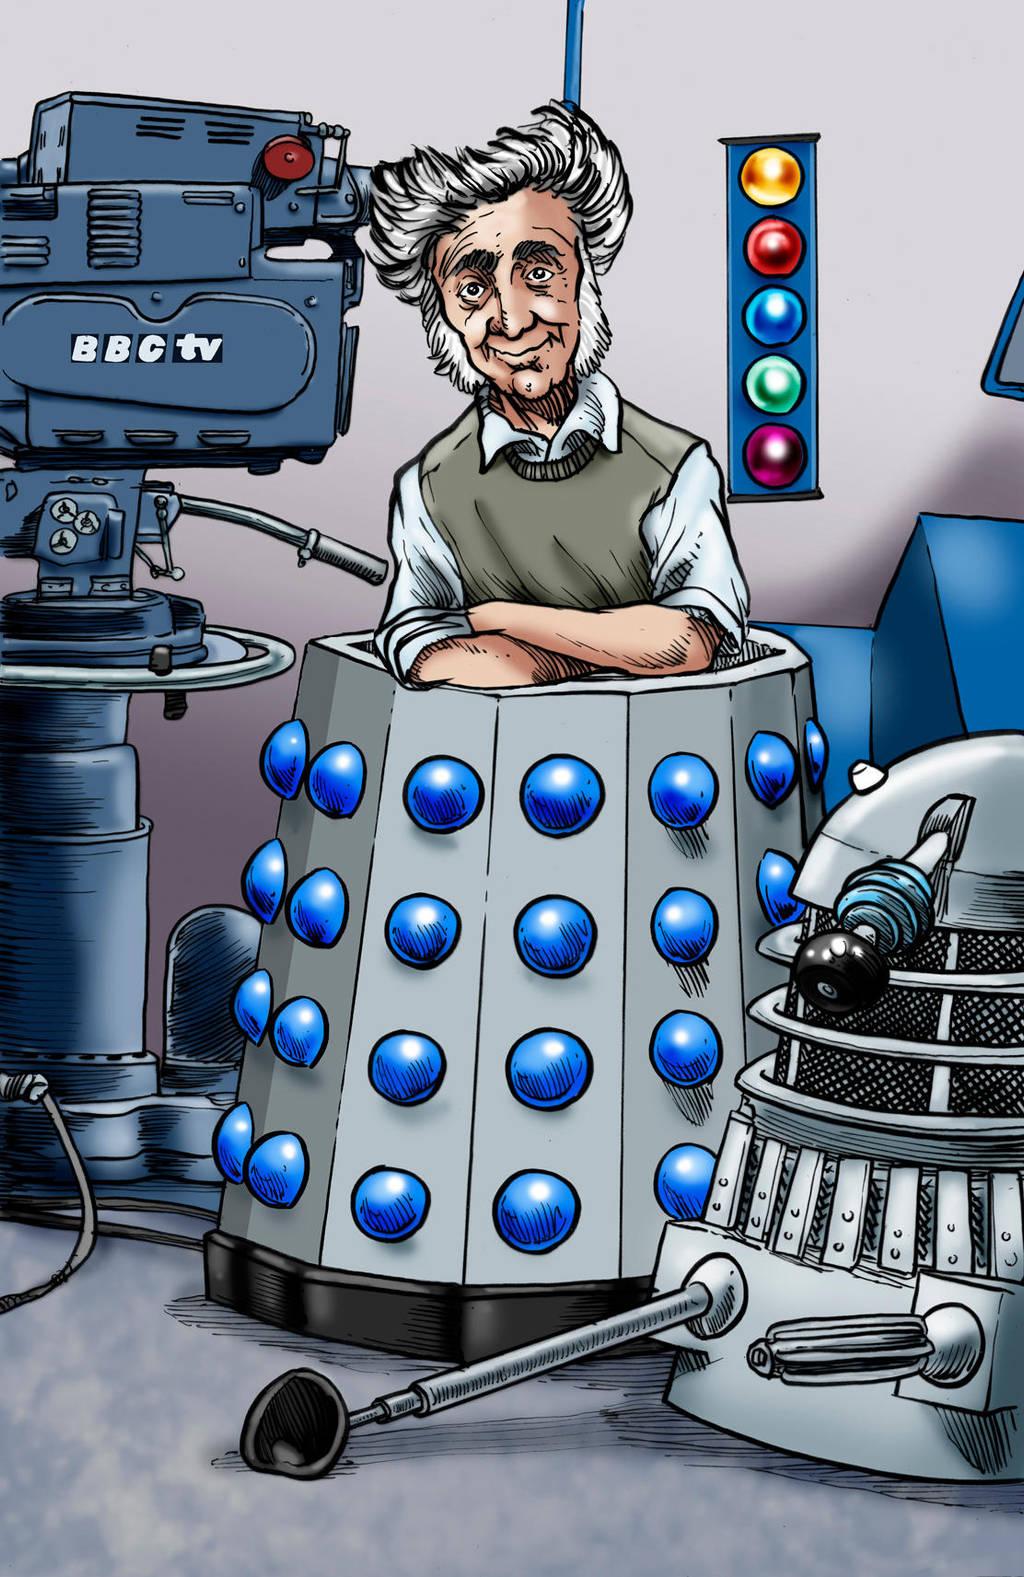 Master Of Daleks by Loneanimator